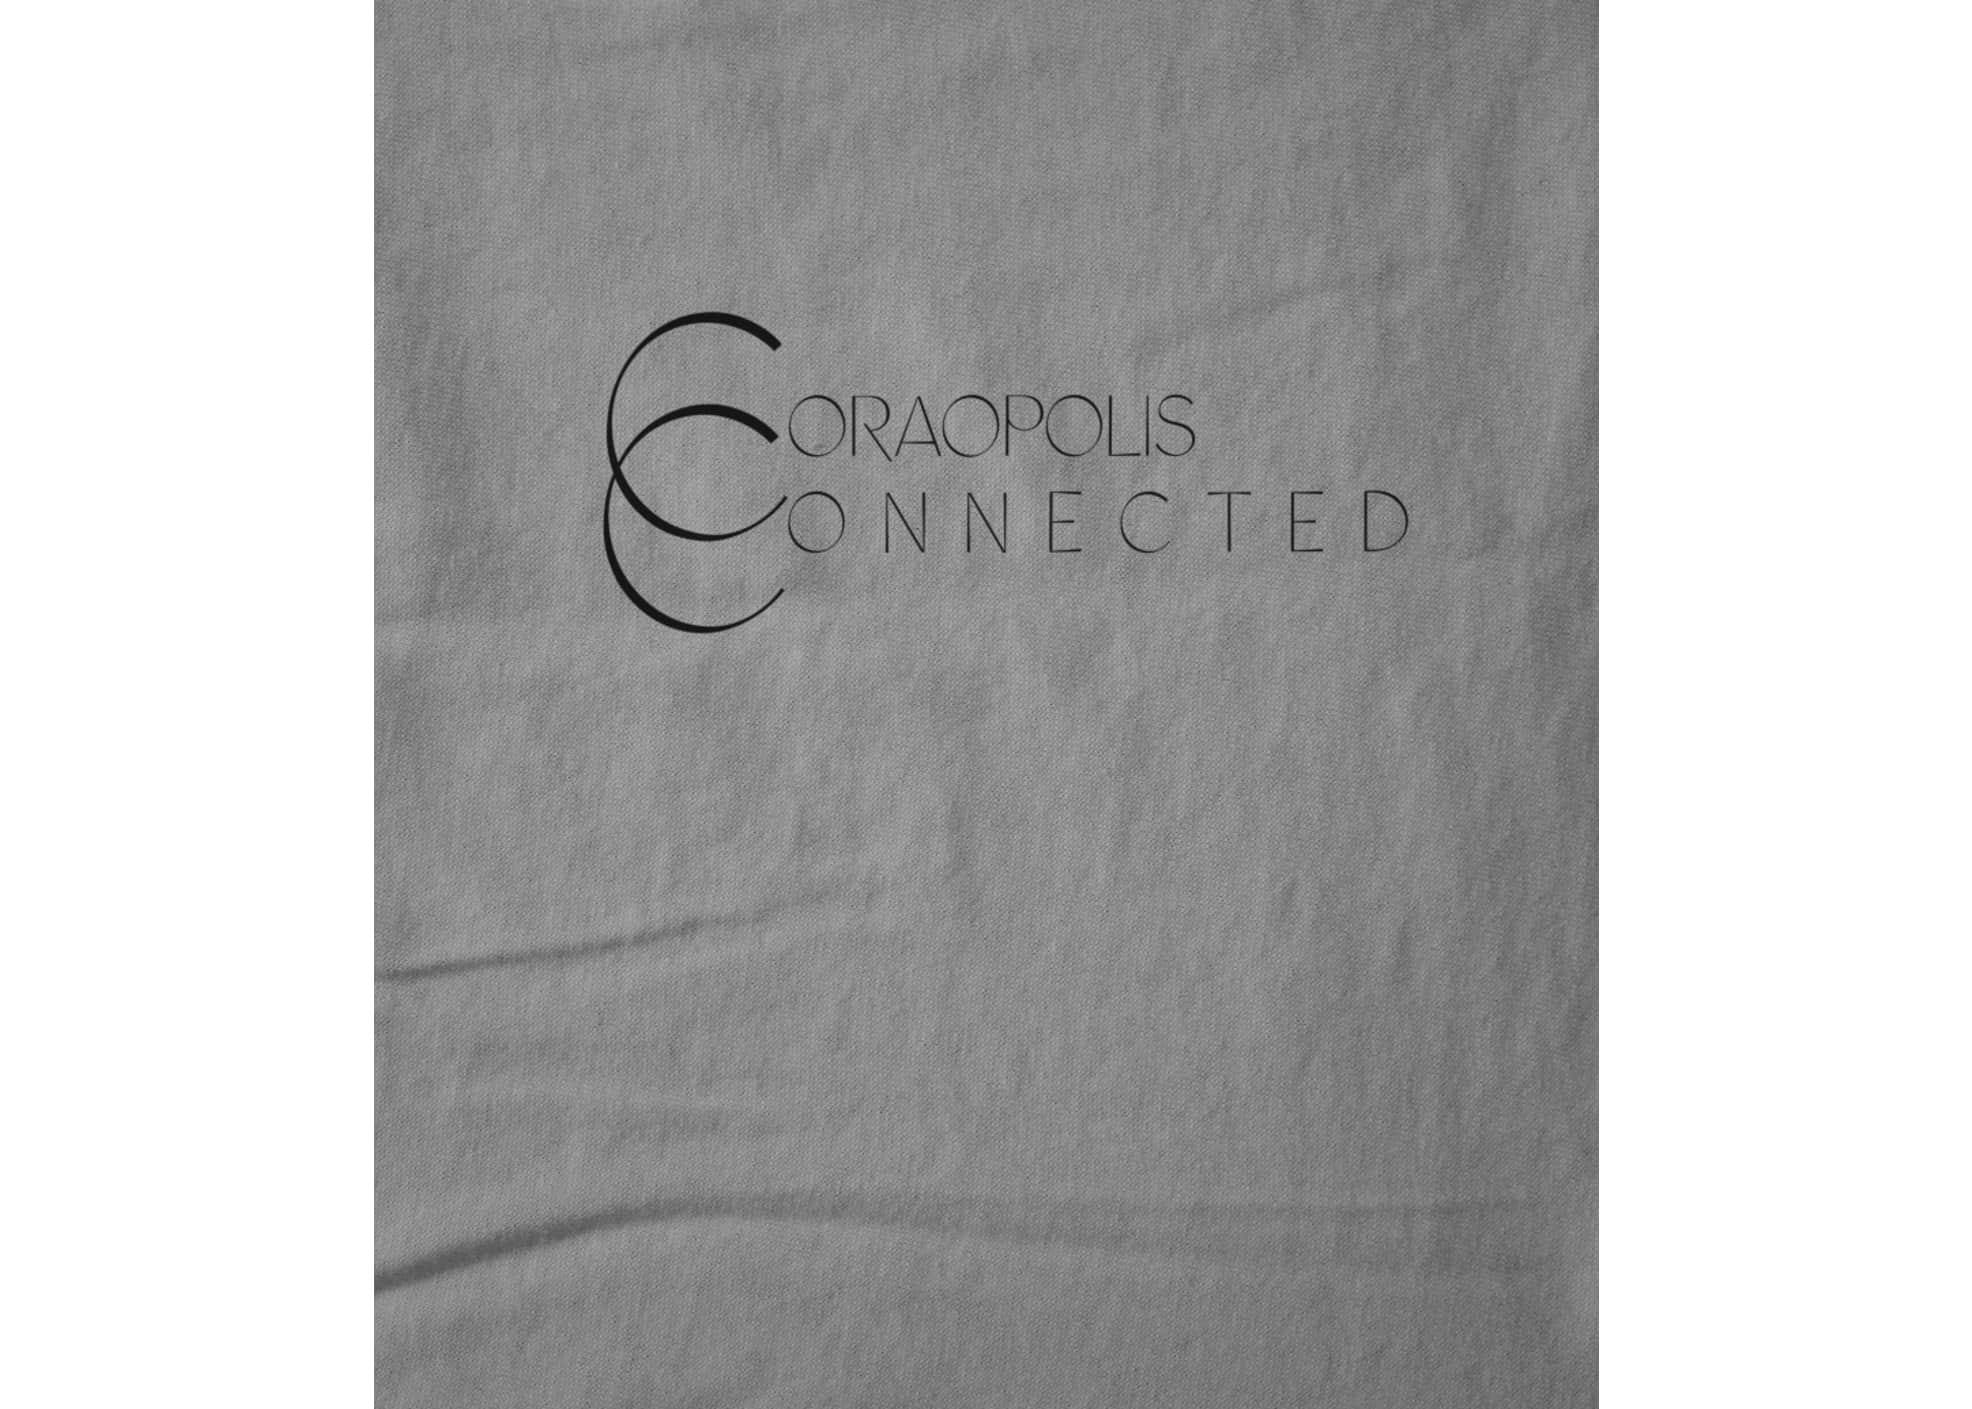 Coraopolis connected white 1627485952